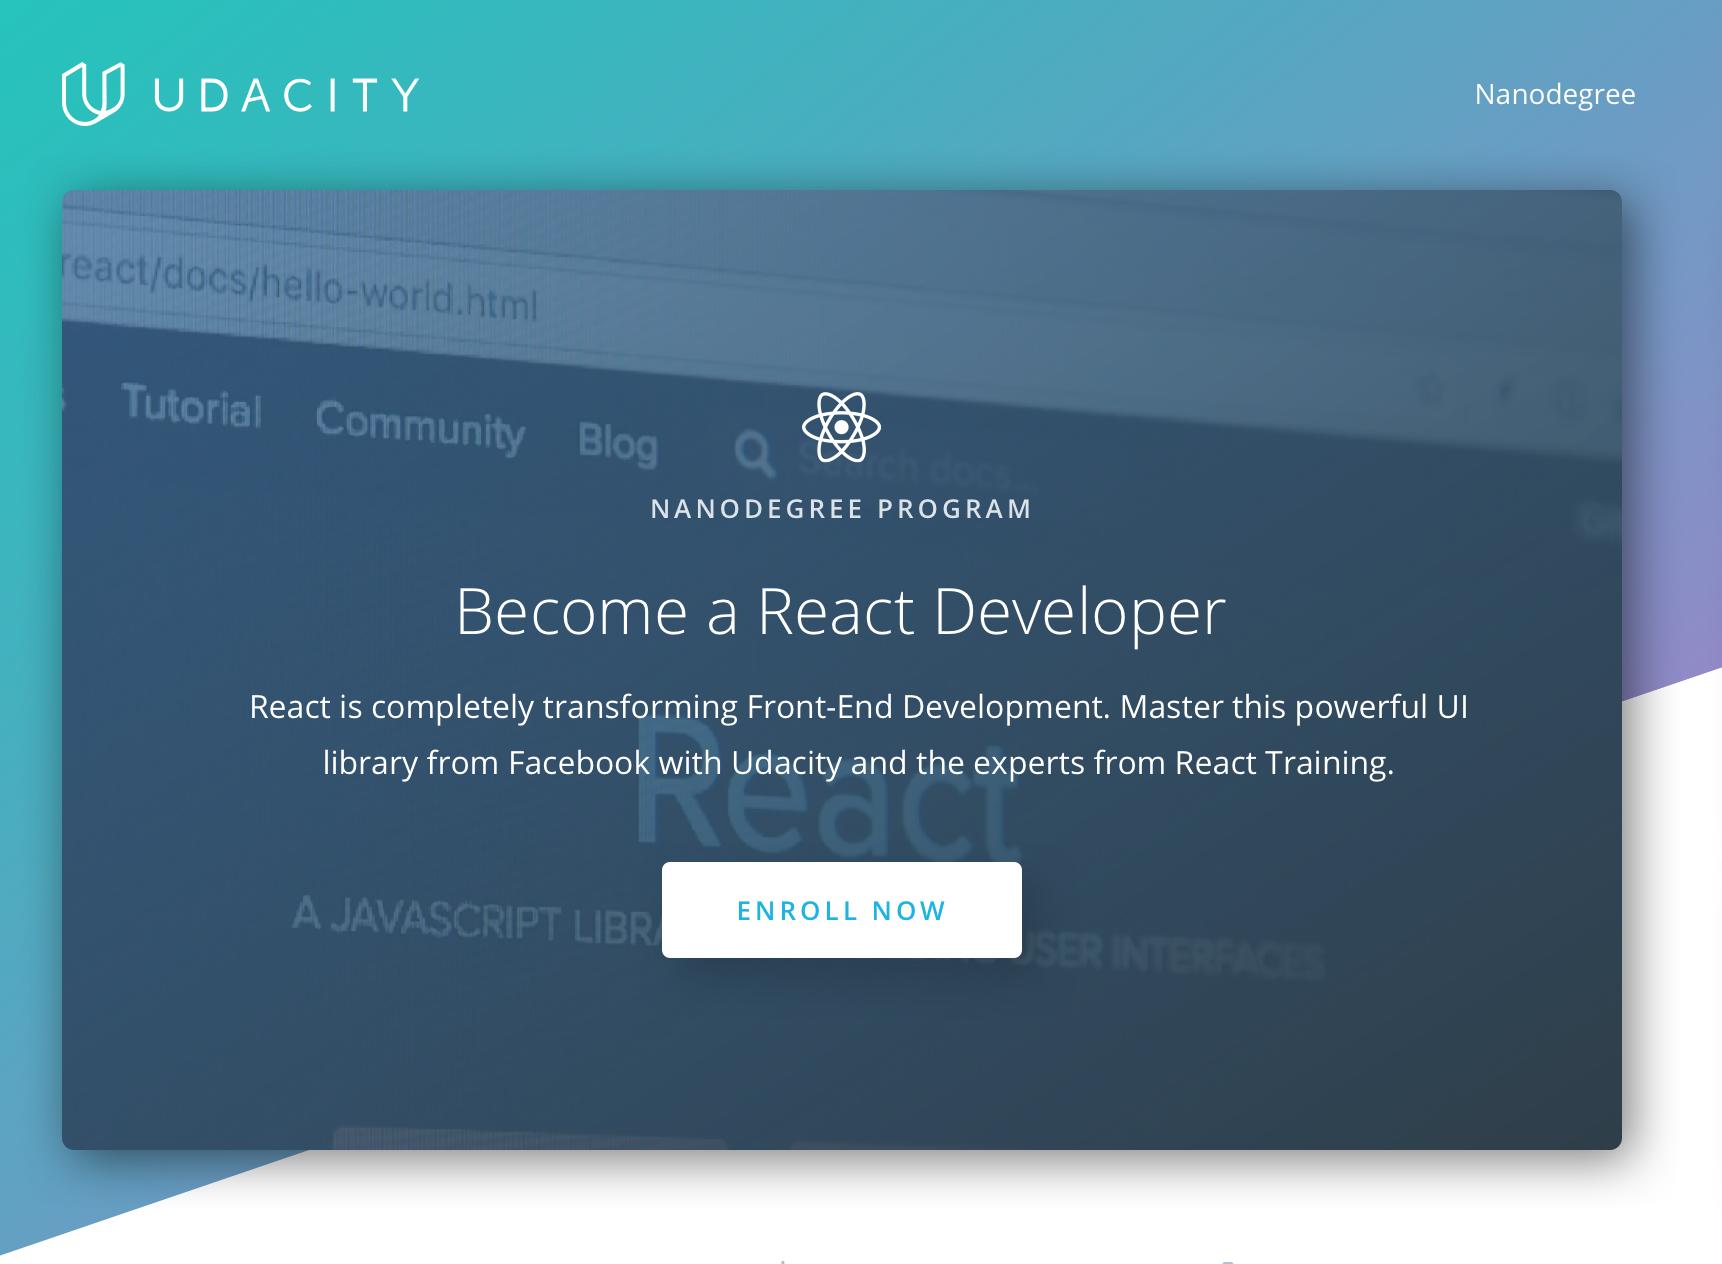 Udacity S Latest Nanodegree Will Teach React Techcrunch